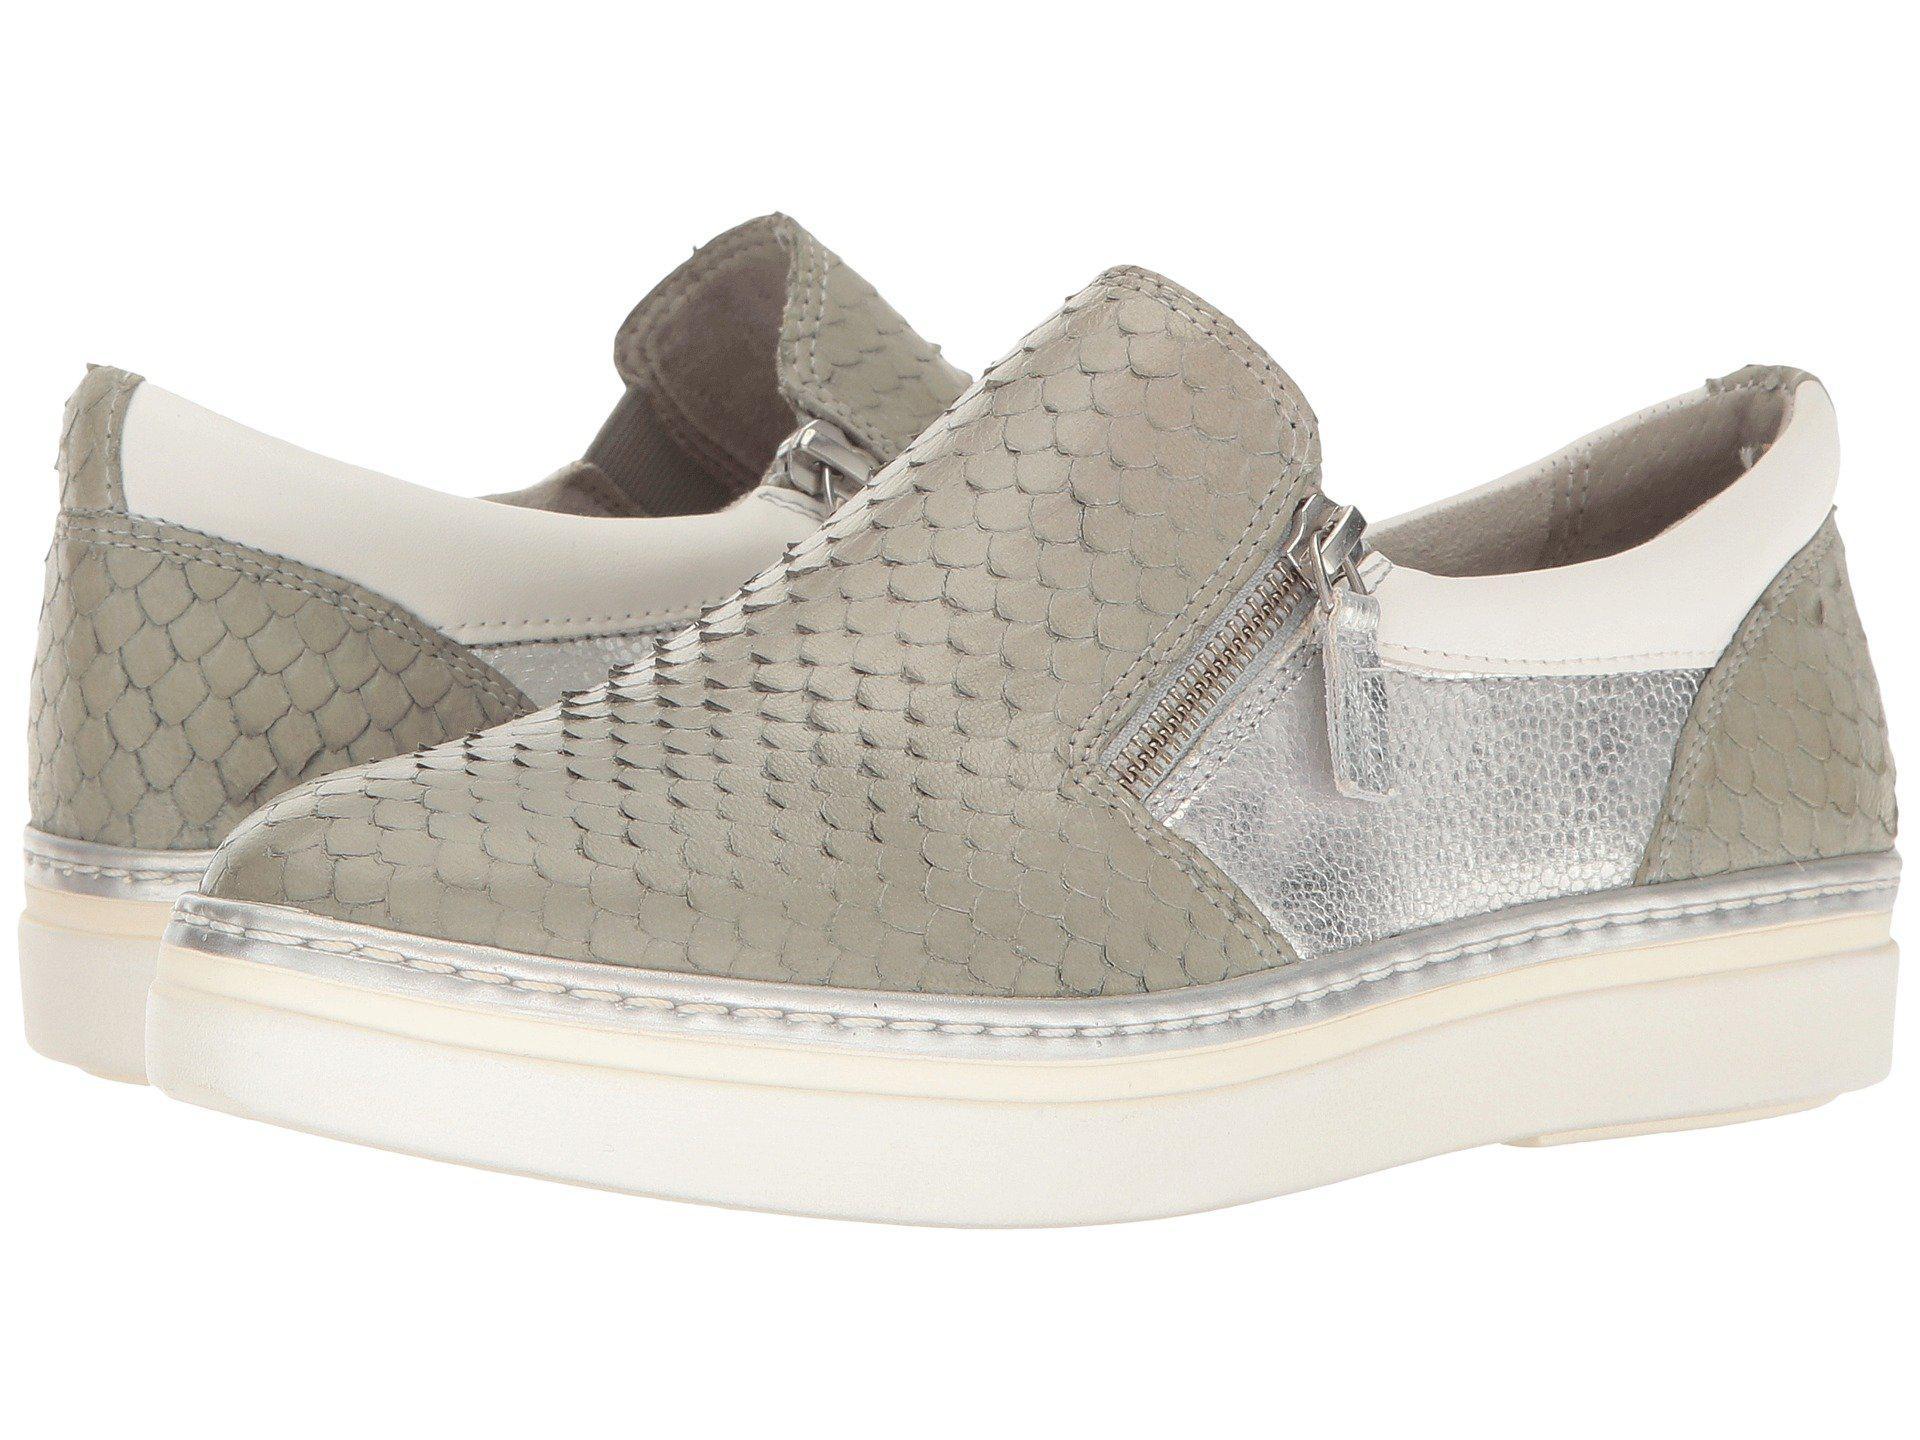 Brand new Tamaris Milla Fashion Sneakers, Women's Fashion